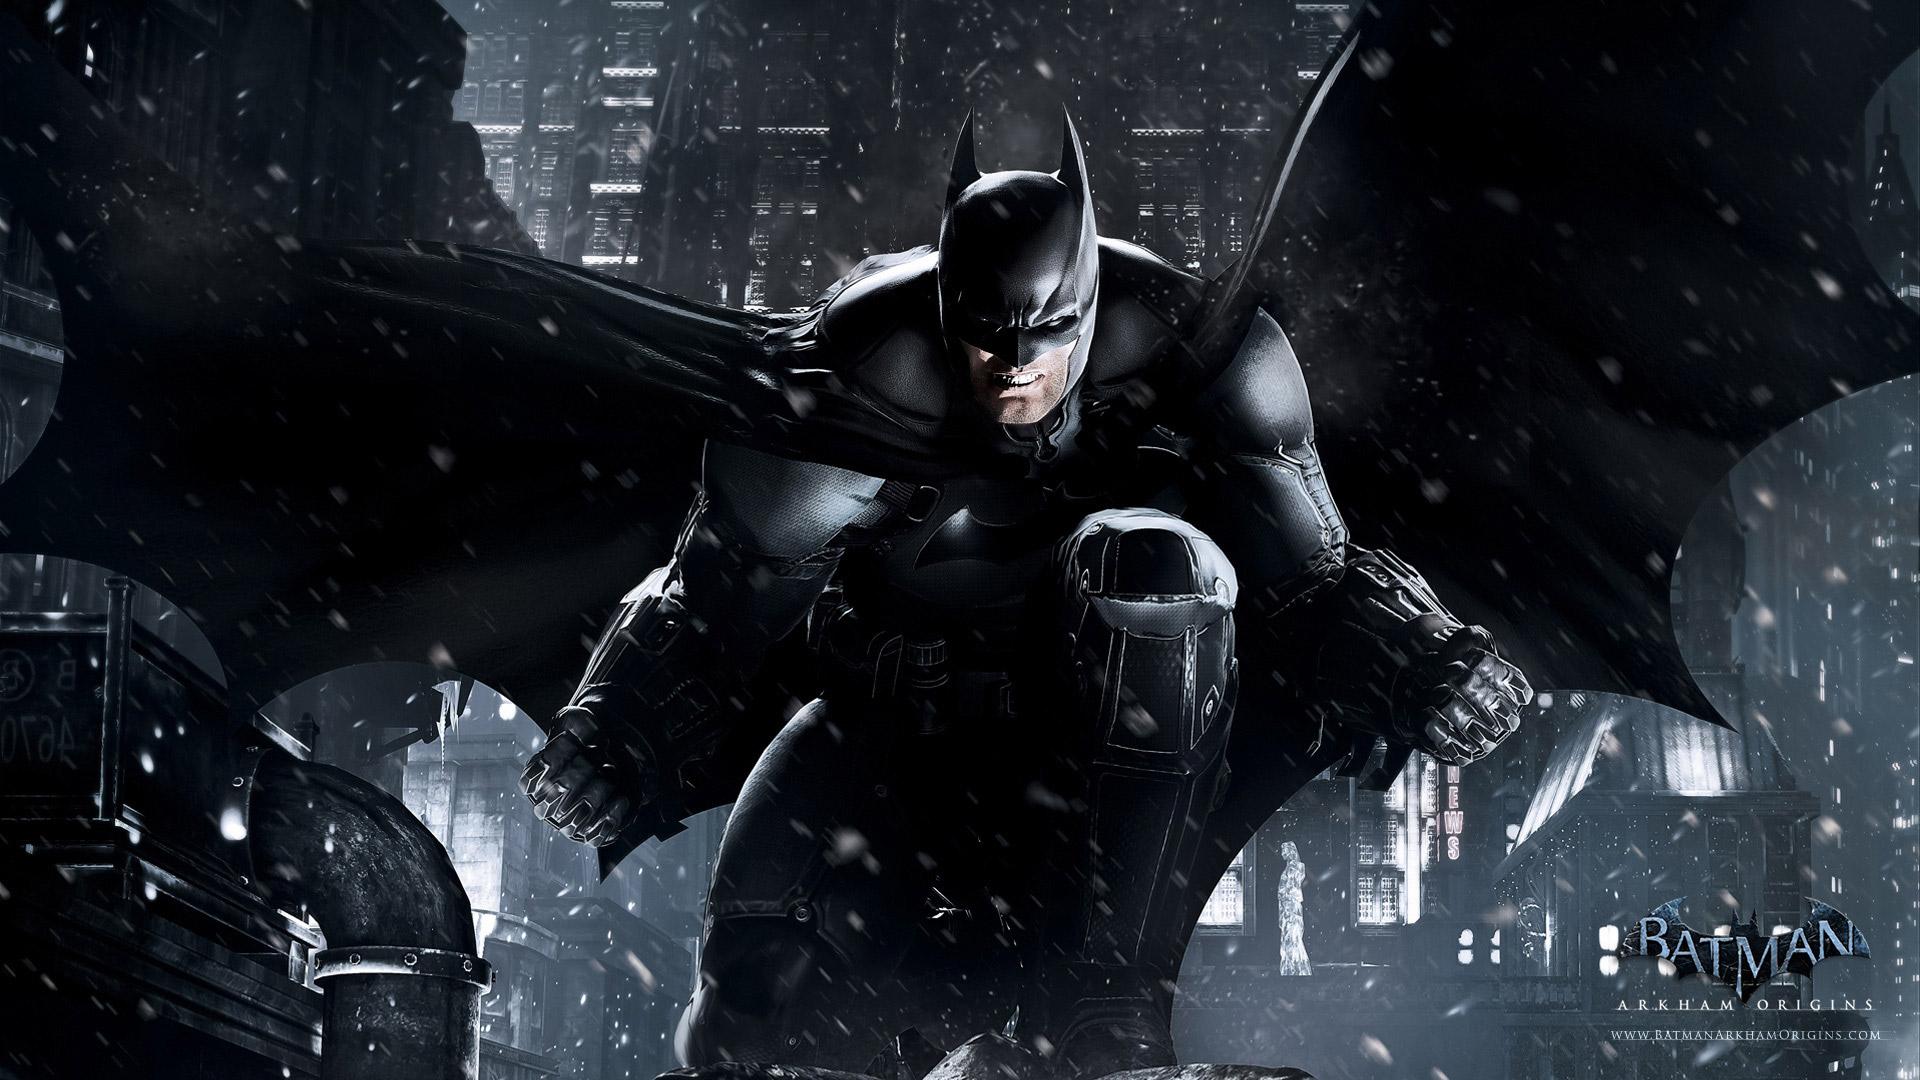 Batman: Arkham Origins Wallpaper in 1920x1080